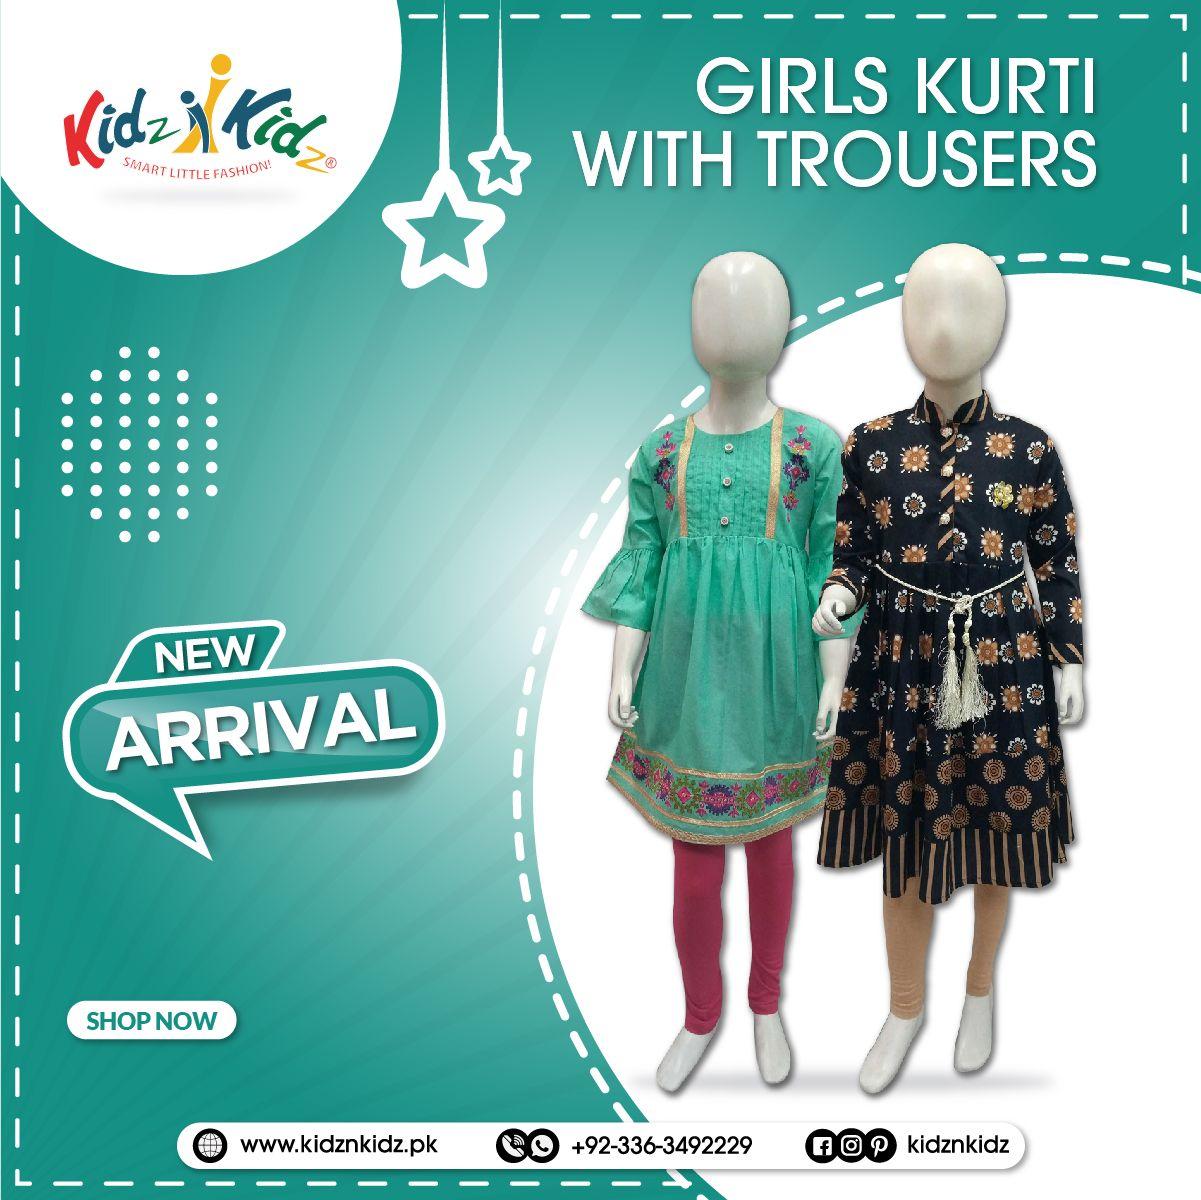 #girlskurti #girls #kurti #trousers #clothingbrand #kids #baby #kidsfahions #onlineshop #shopping #onlinestore #shoppingonline #onlineshopping